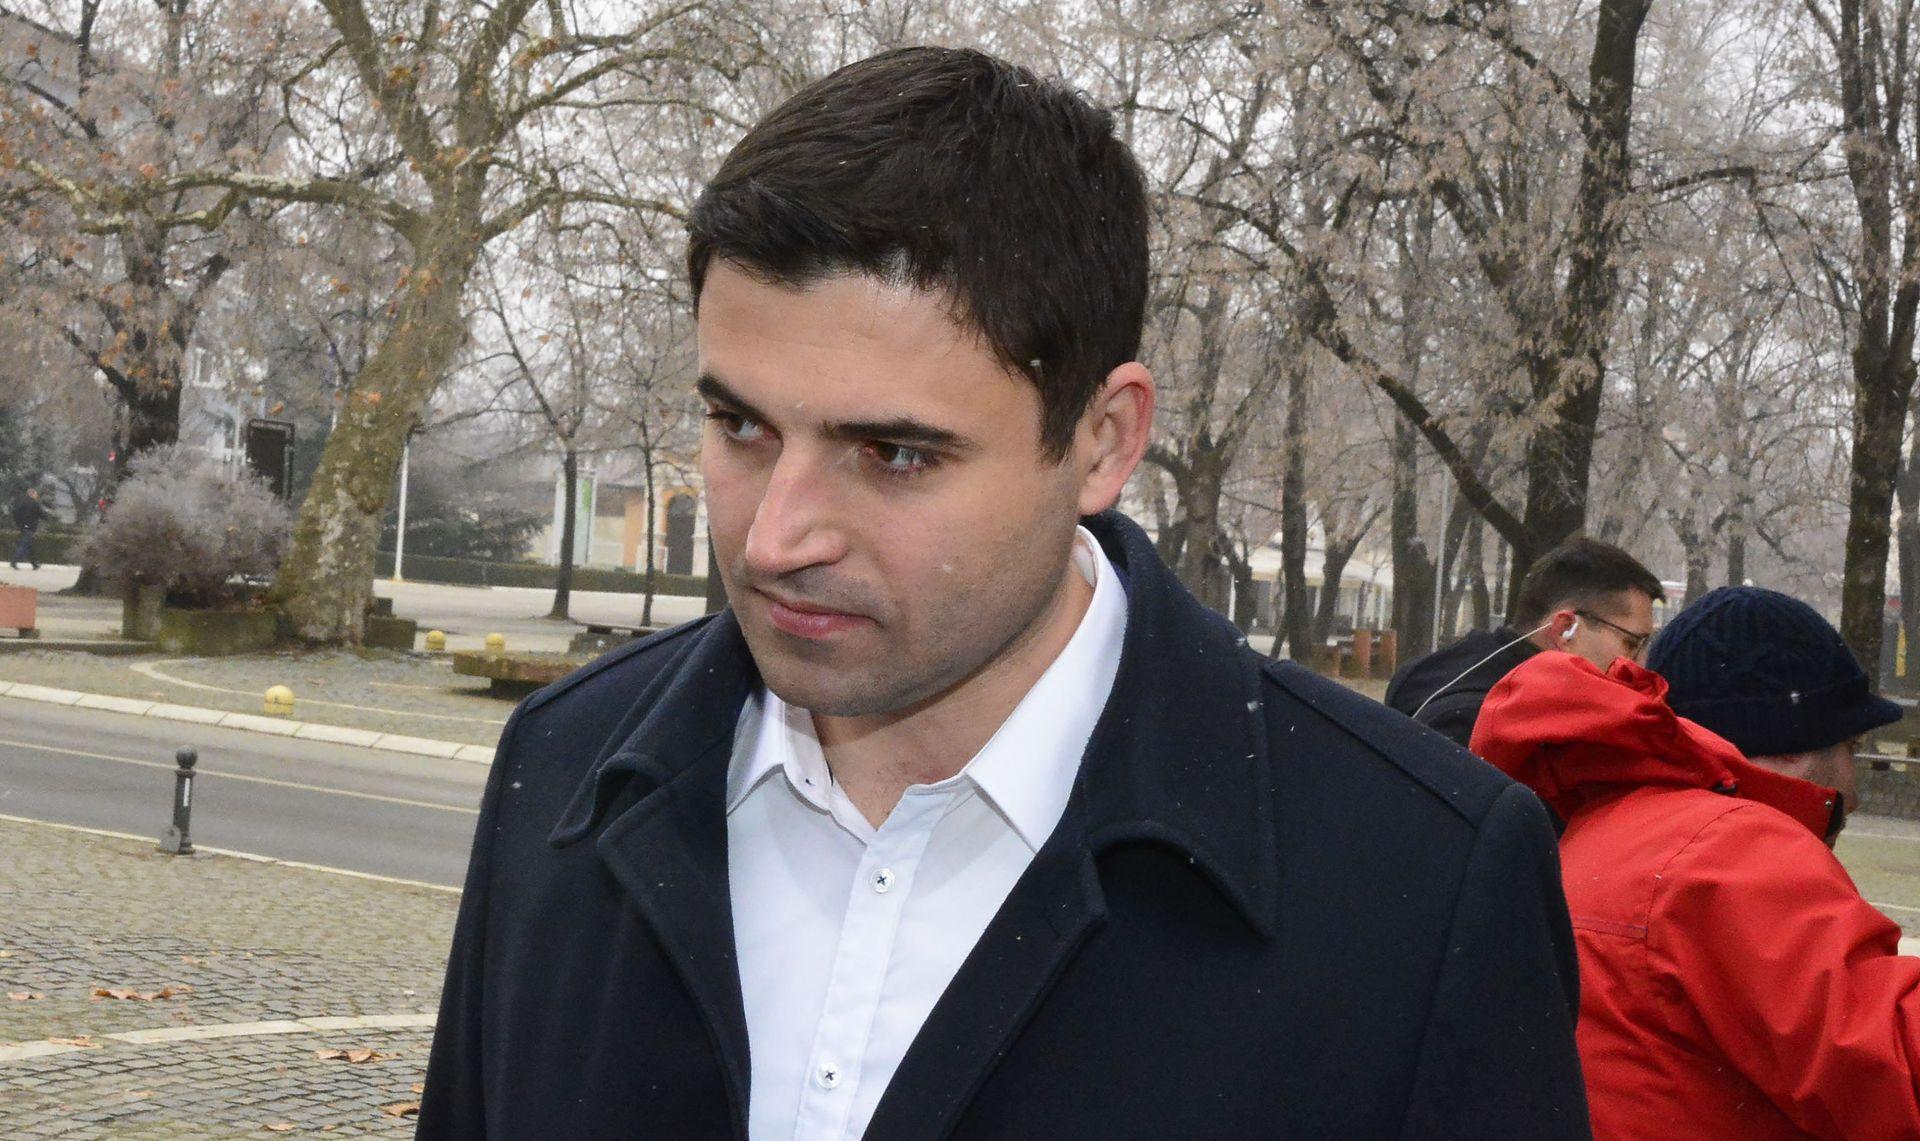 Predsjedništvo SDP-a: Arsen Bauk predsjednik Kluba zastupnika SDP-a